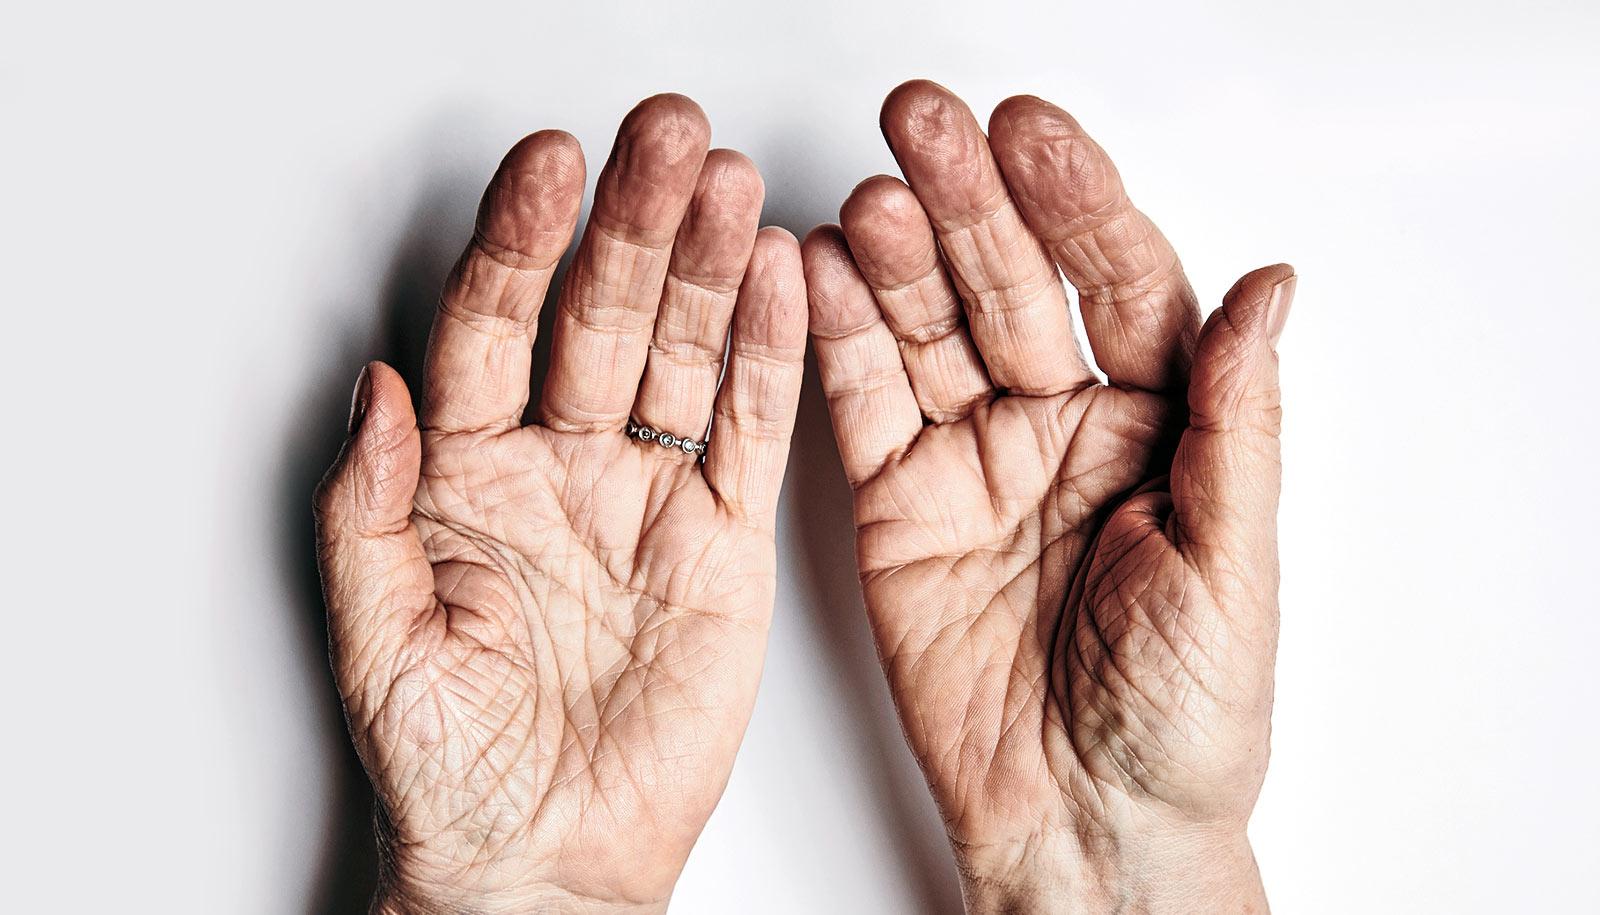 Weak handgrip may warn of cognitive impairment